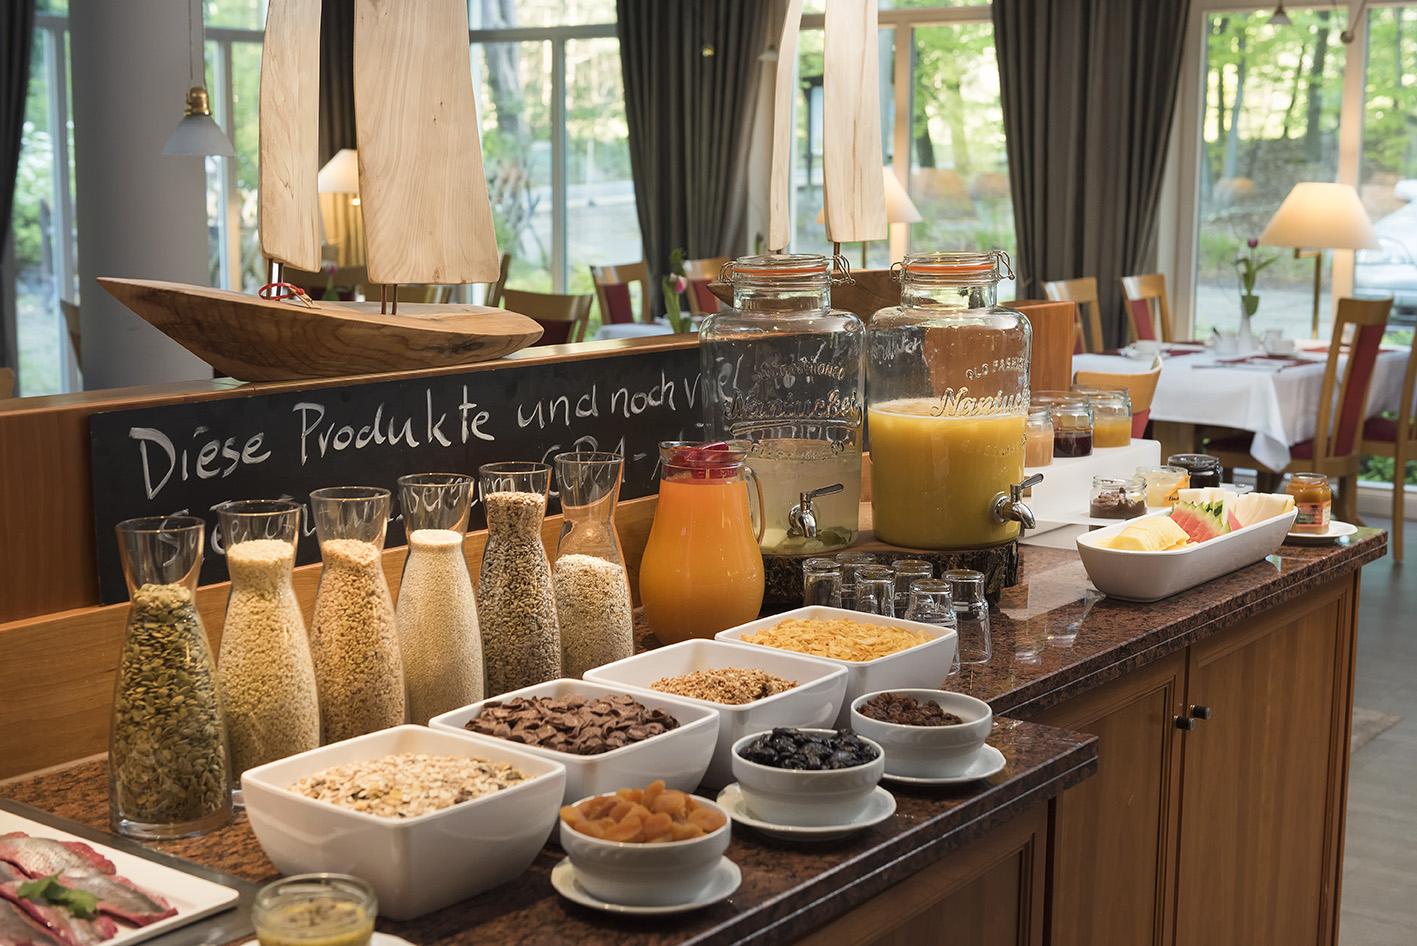 Best Western Waldschlösschen Prerow frühstücksbuffet müsli